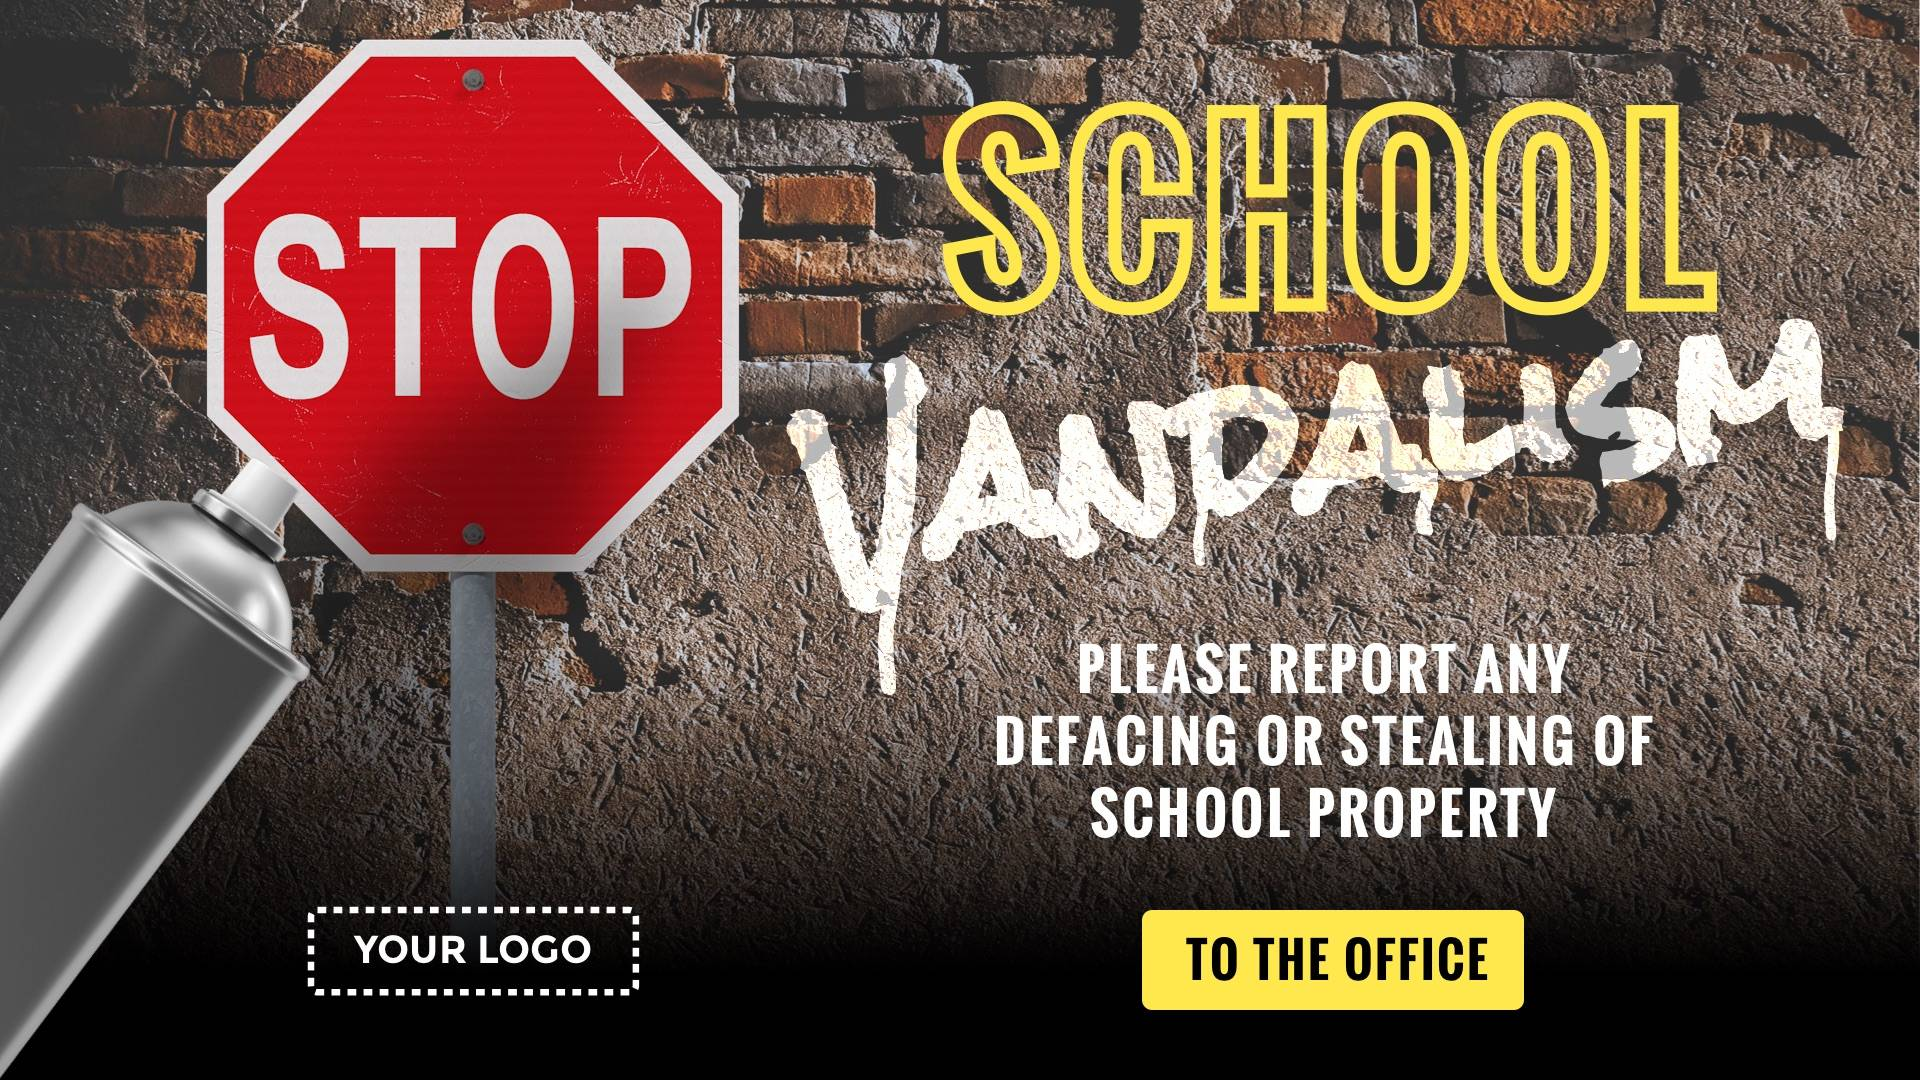 Stop School Vandalism Digital Signage Template